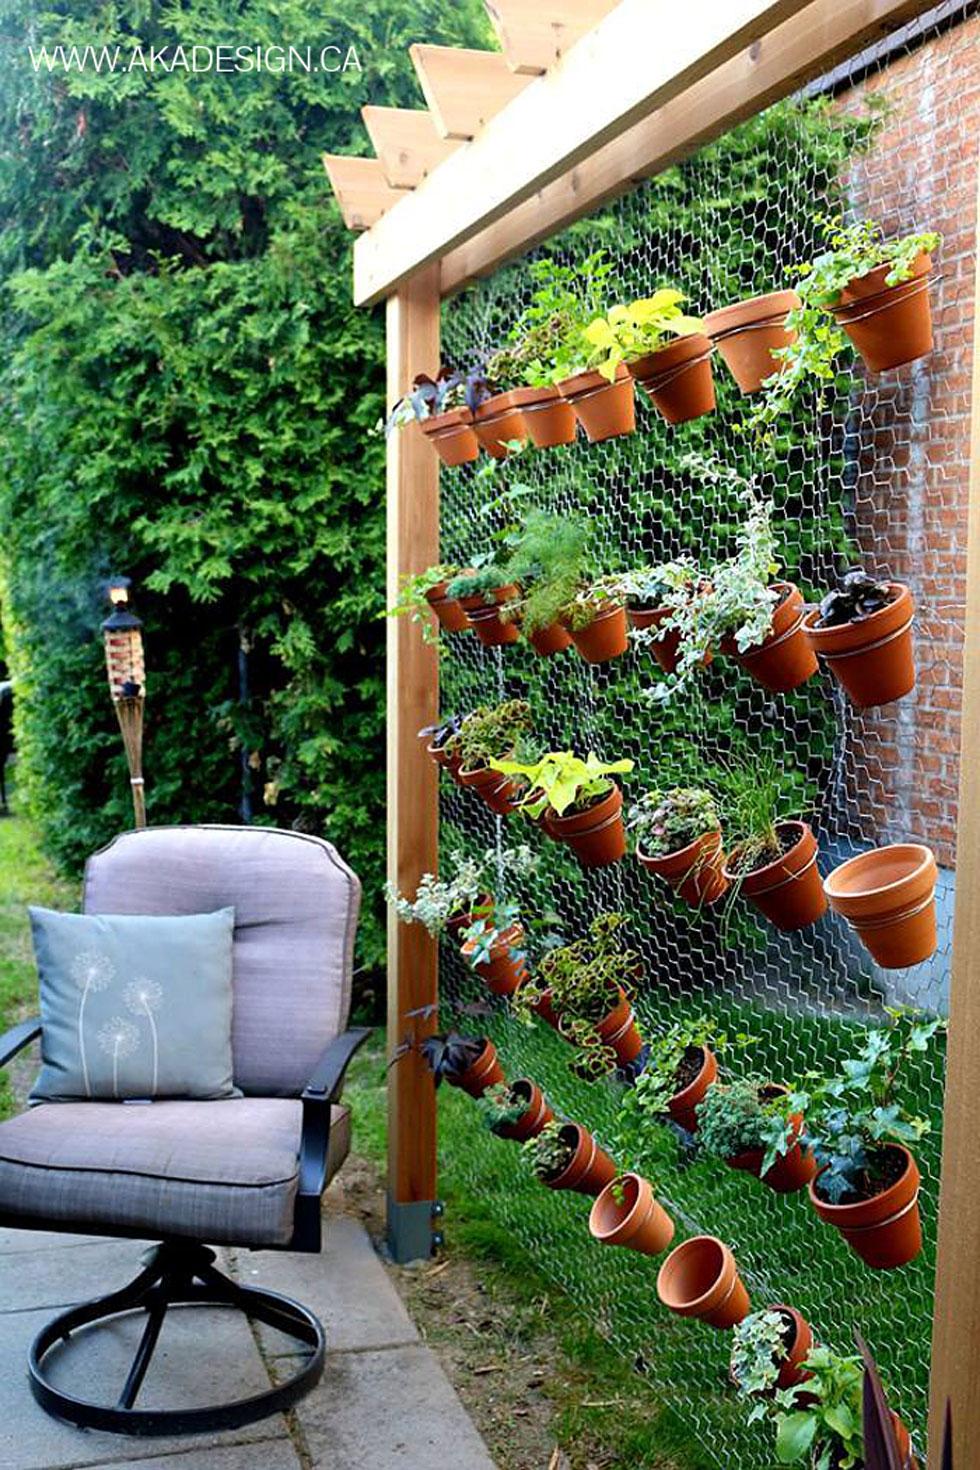 Backyard Landscape: 16 Amazing DIY Patio Decoration Ideas ... on Diy Small Patio Ideas id=98873